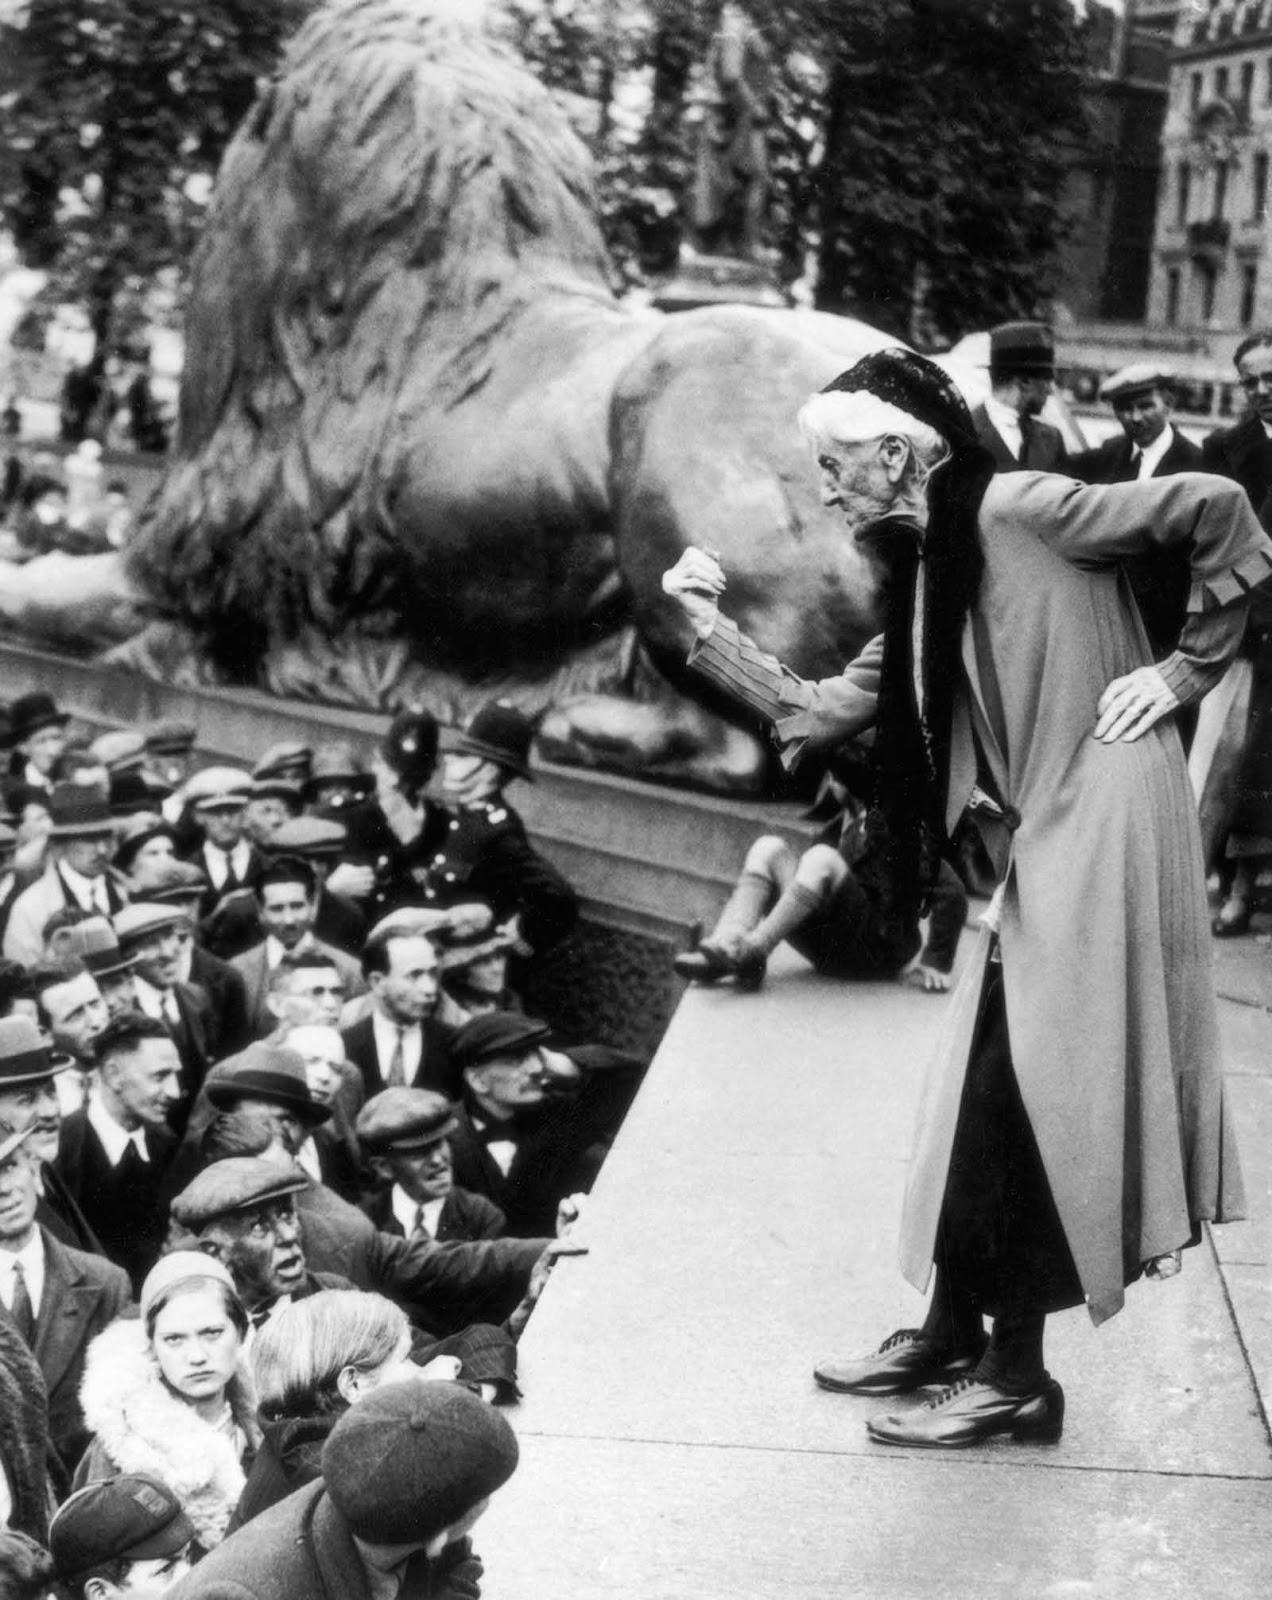 British suffragette Charlotte Despard (1844-1939) addresses the crowd in Trafalgar Square during a Communist rally. 1933.